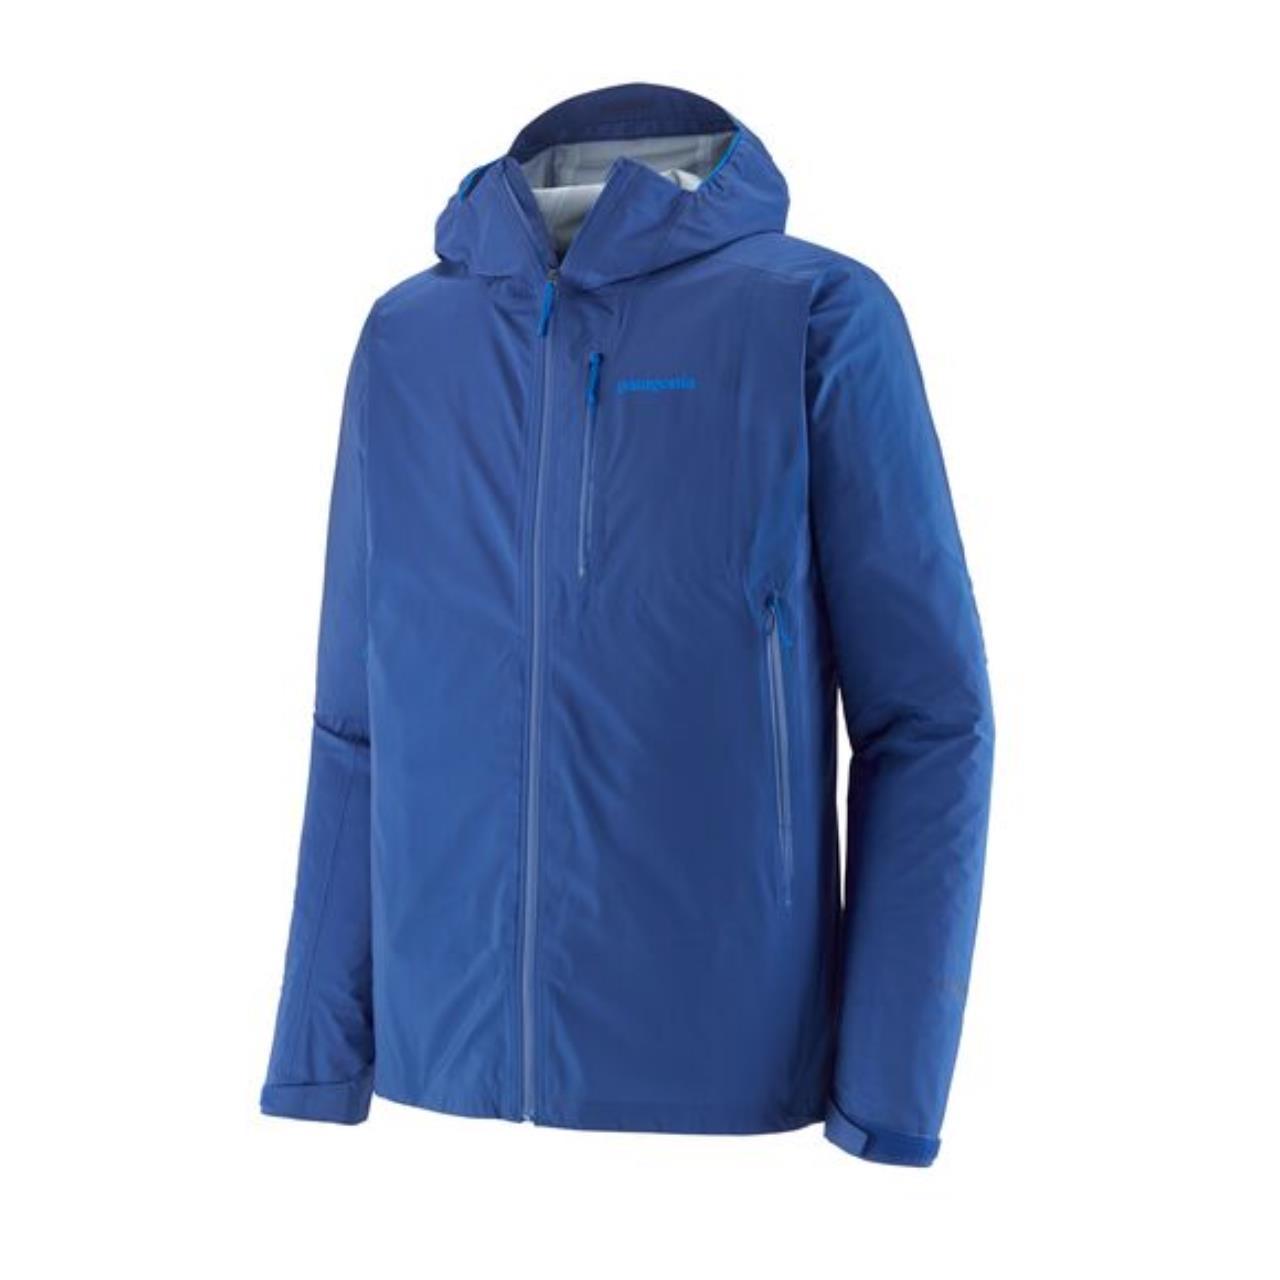 Storm10 Jacket Men